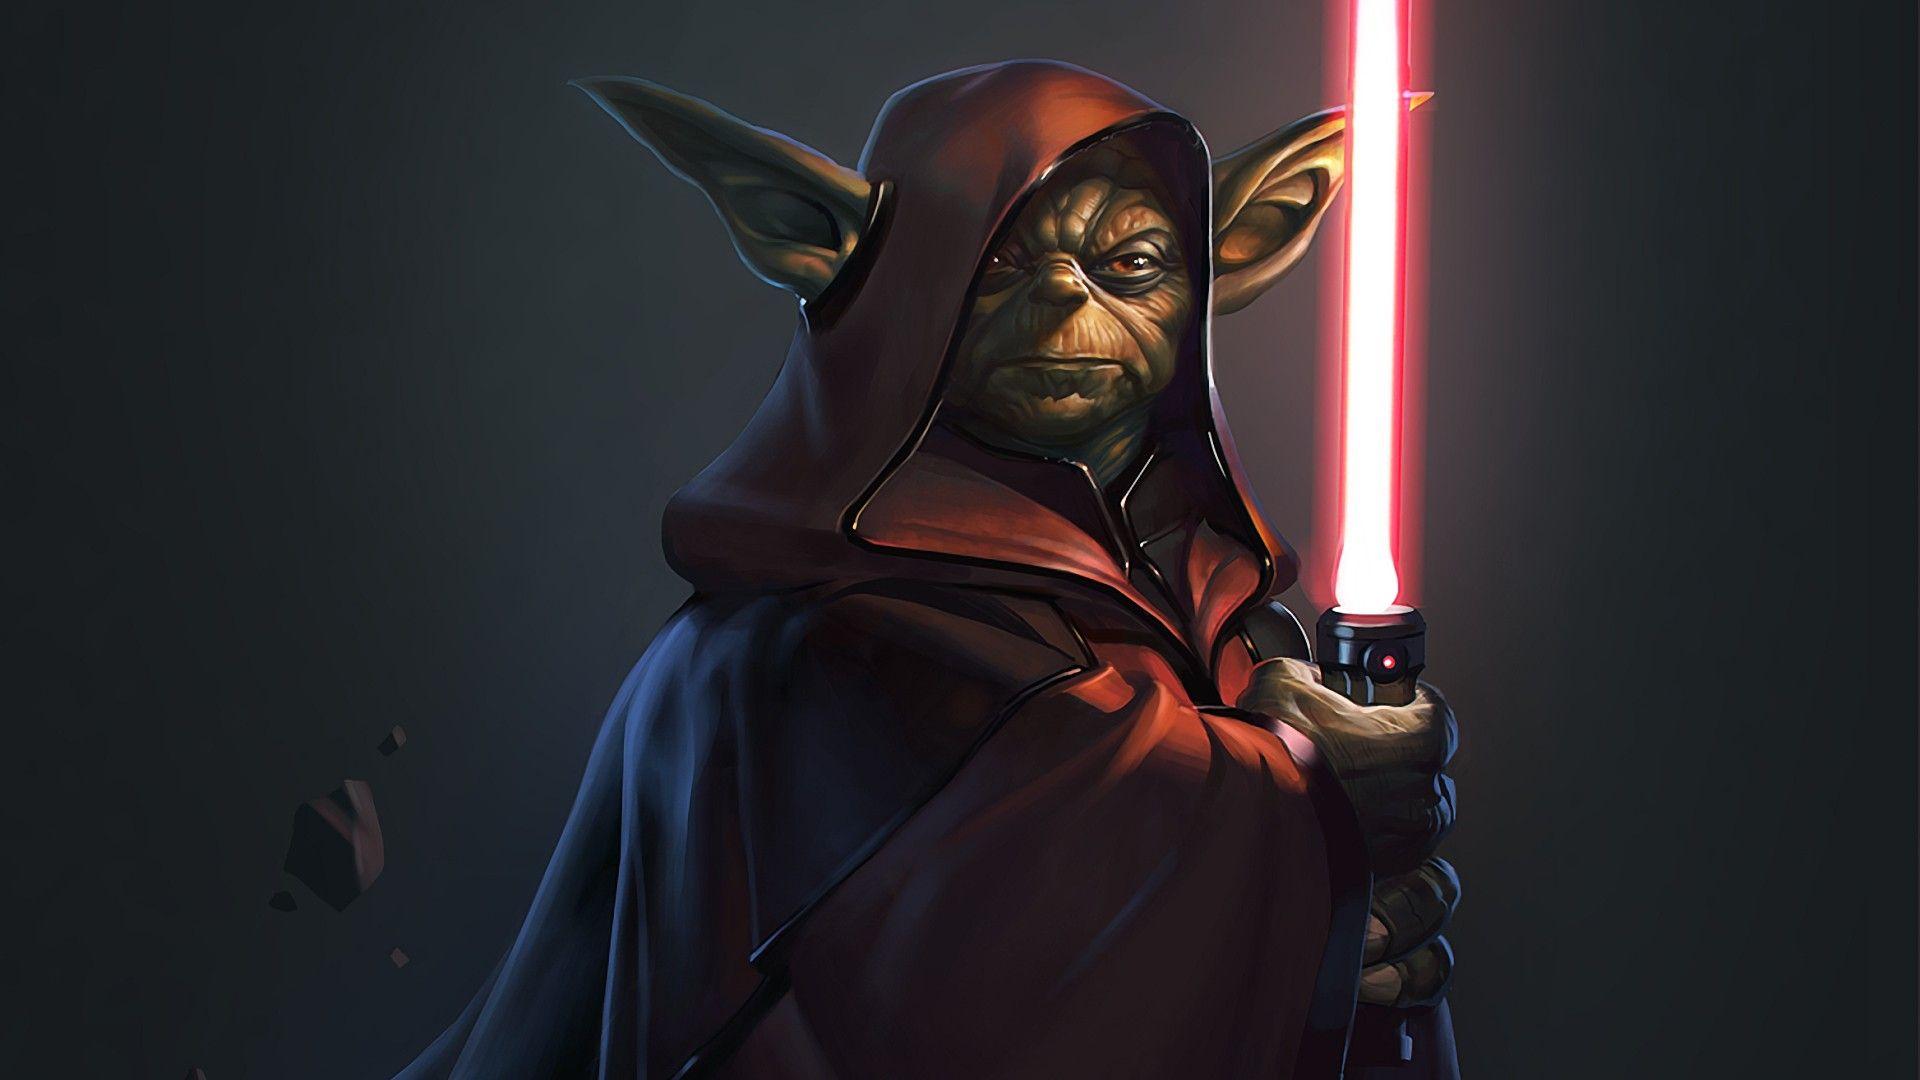 Pin By Rs Monroe On Star Wars Universe Yoda Wallpaper Dark Side Star Wars Star Wars Artwork